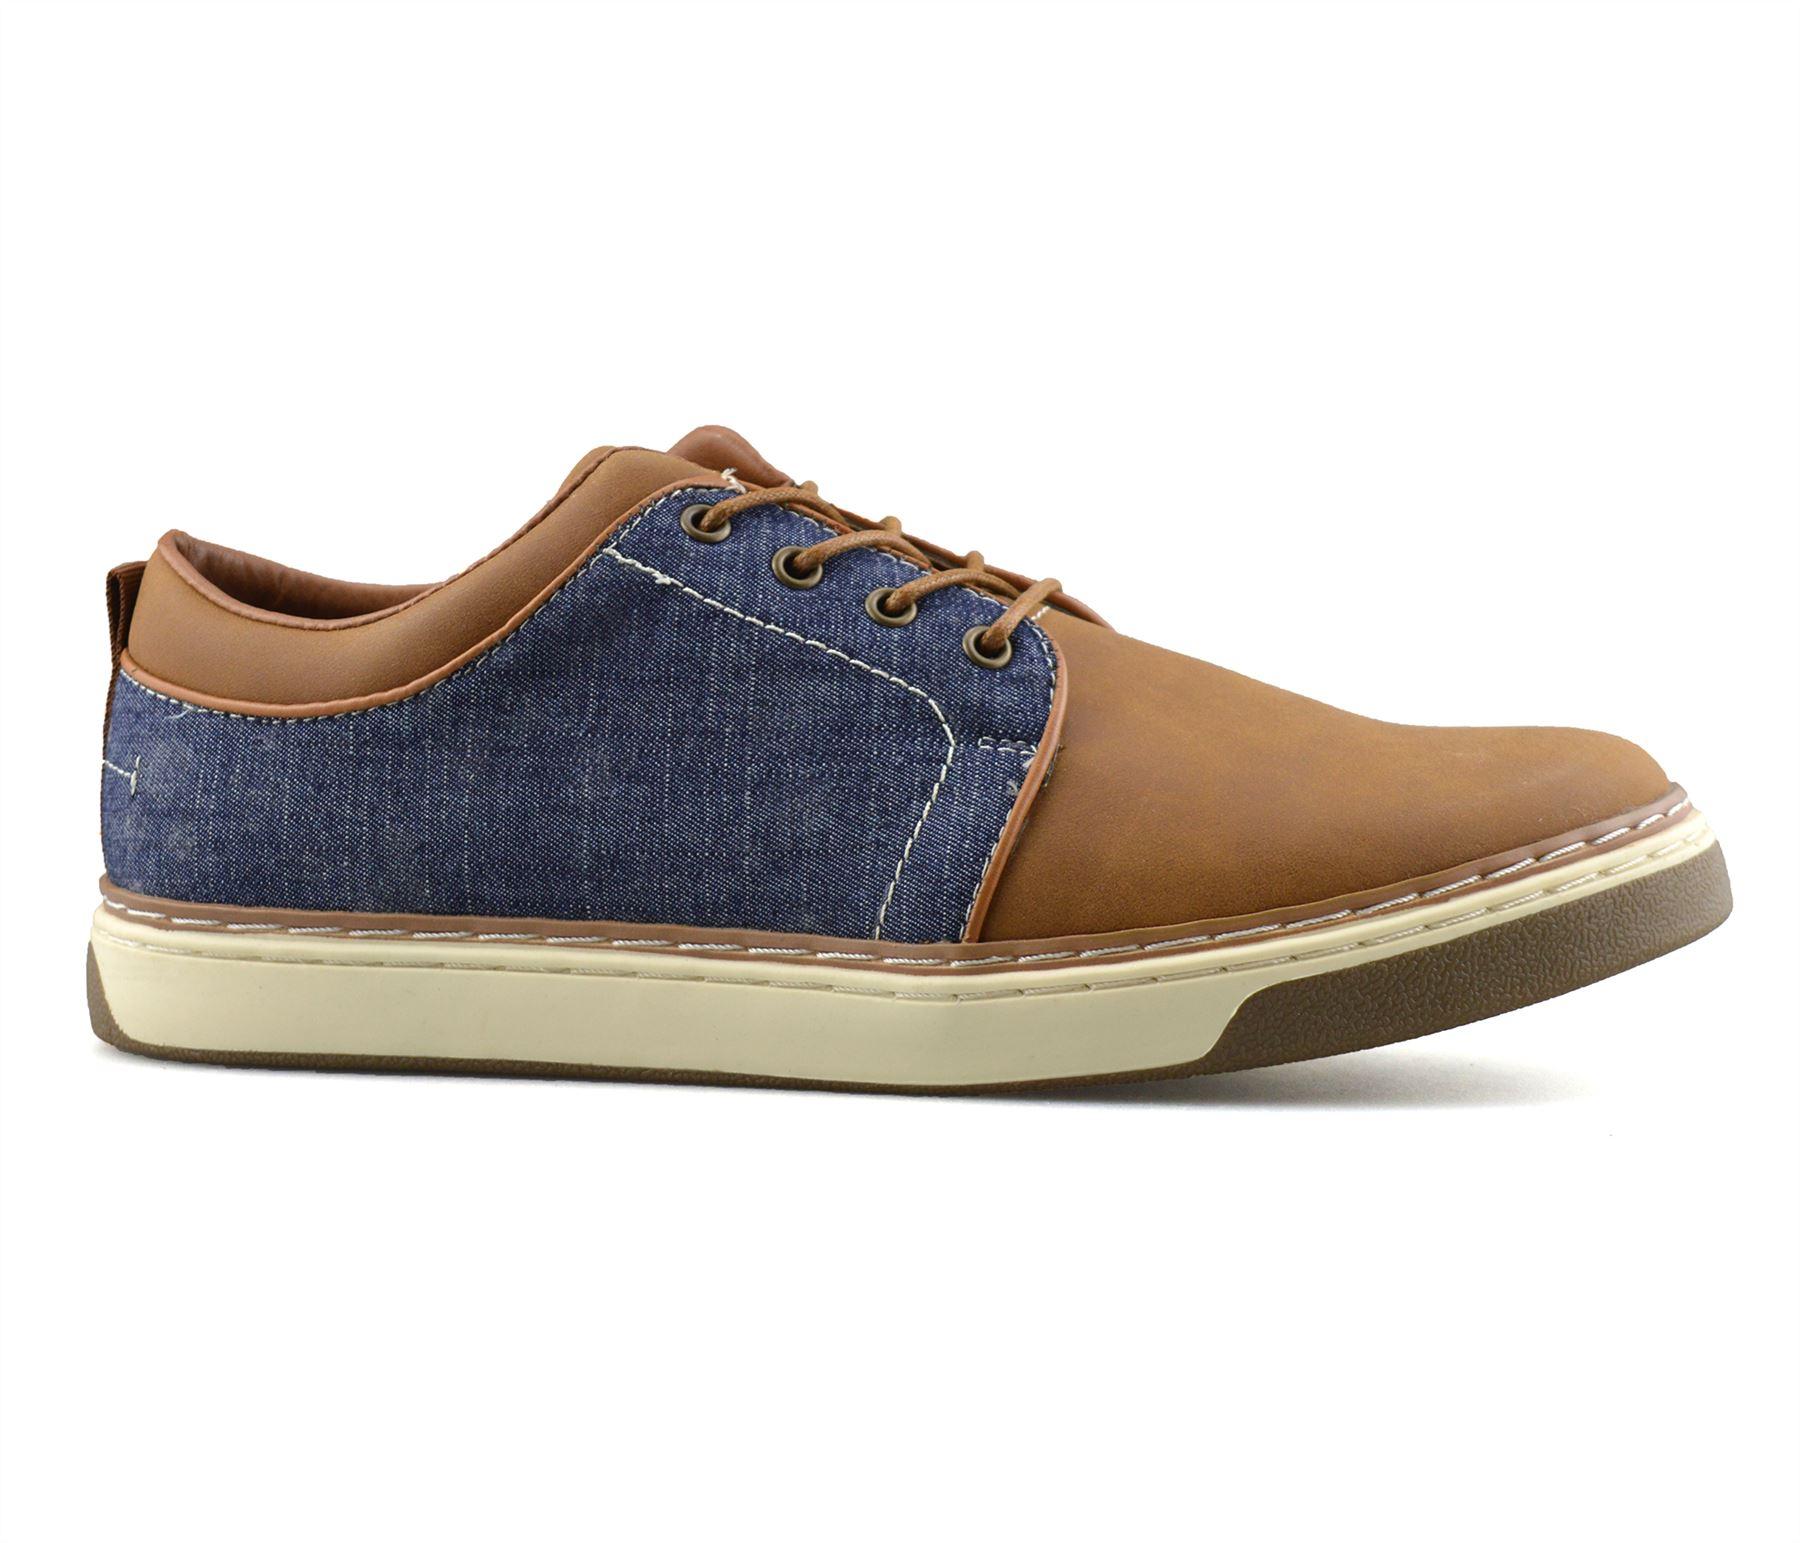 Homme-Nouveau-Casual-Smart-bateau-pont-Mocassin-Walking-Driving-Work-Lace-Up-Chaussures-Taille miniature 19